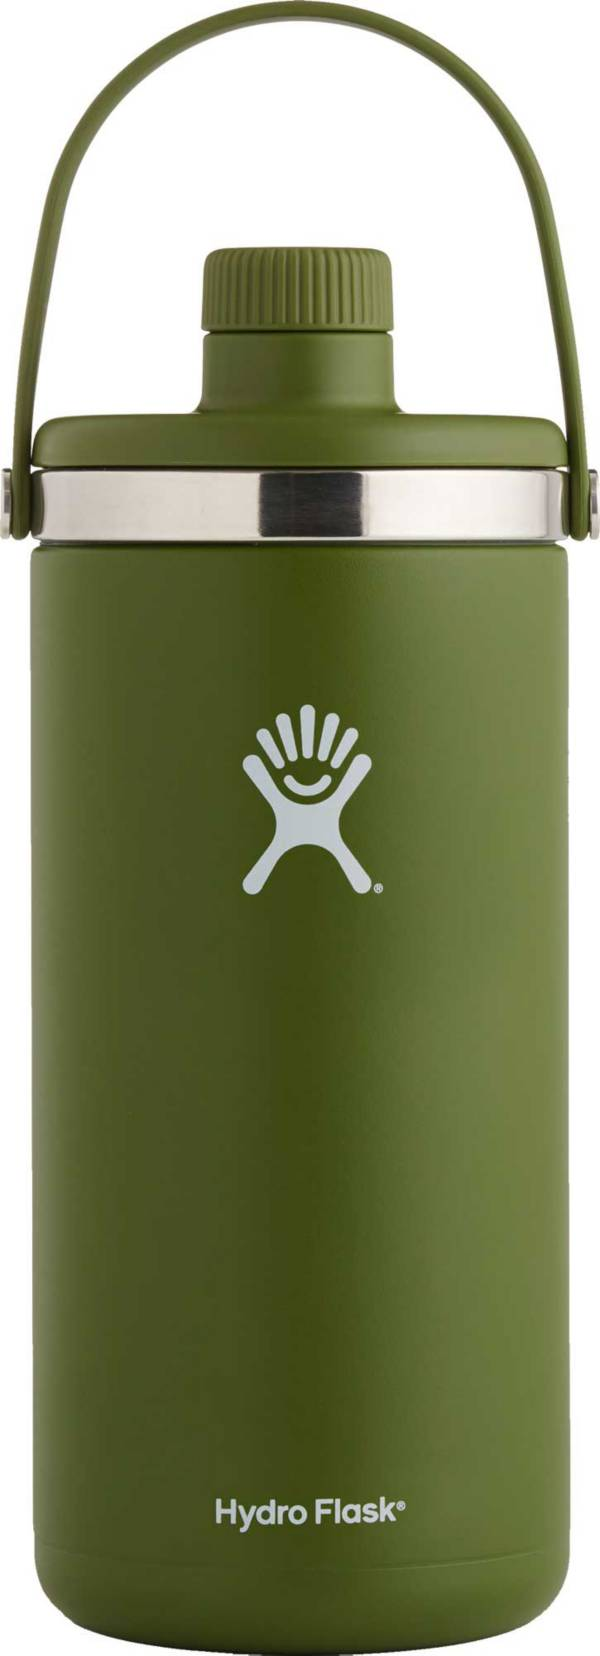 Hydro Flask 1 Gallon Oasis Jug product image